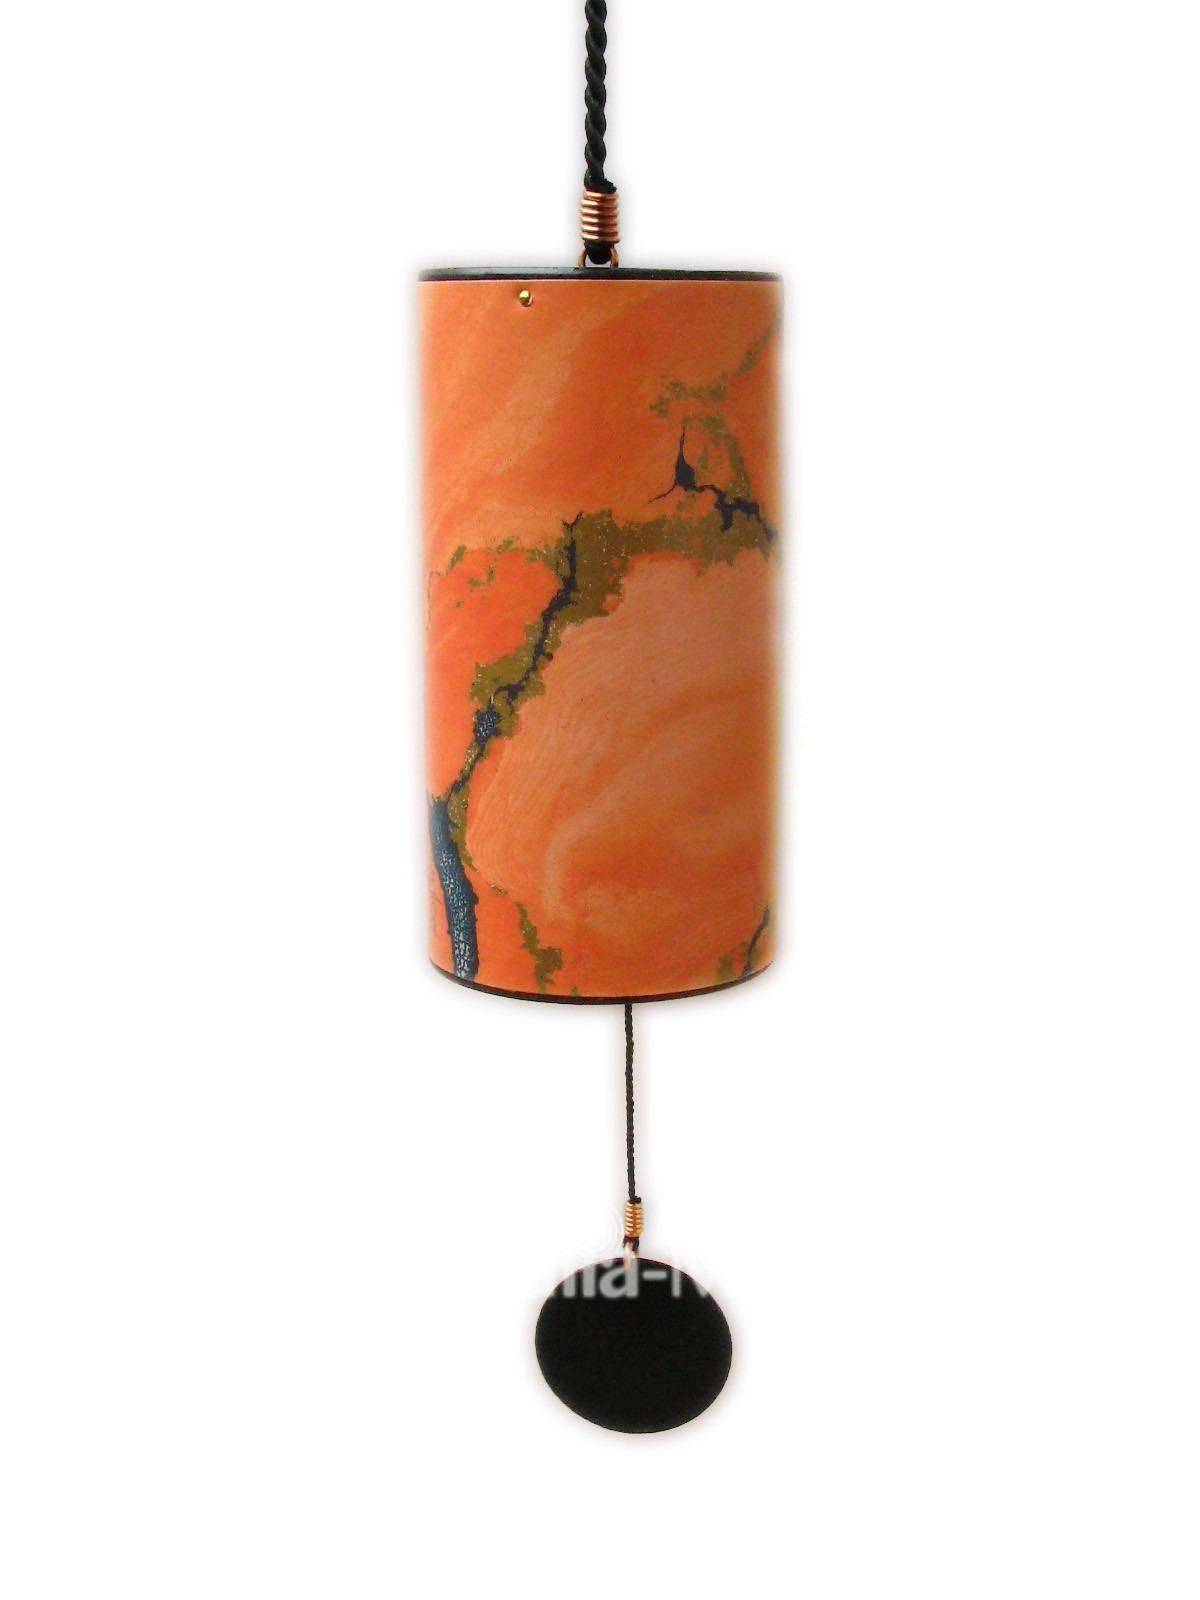 Zaphir couleur orange